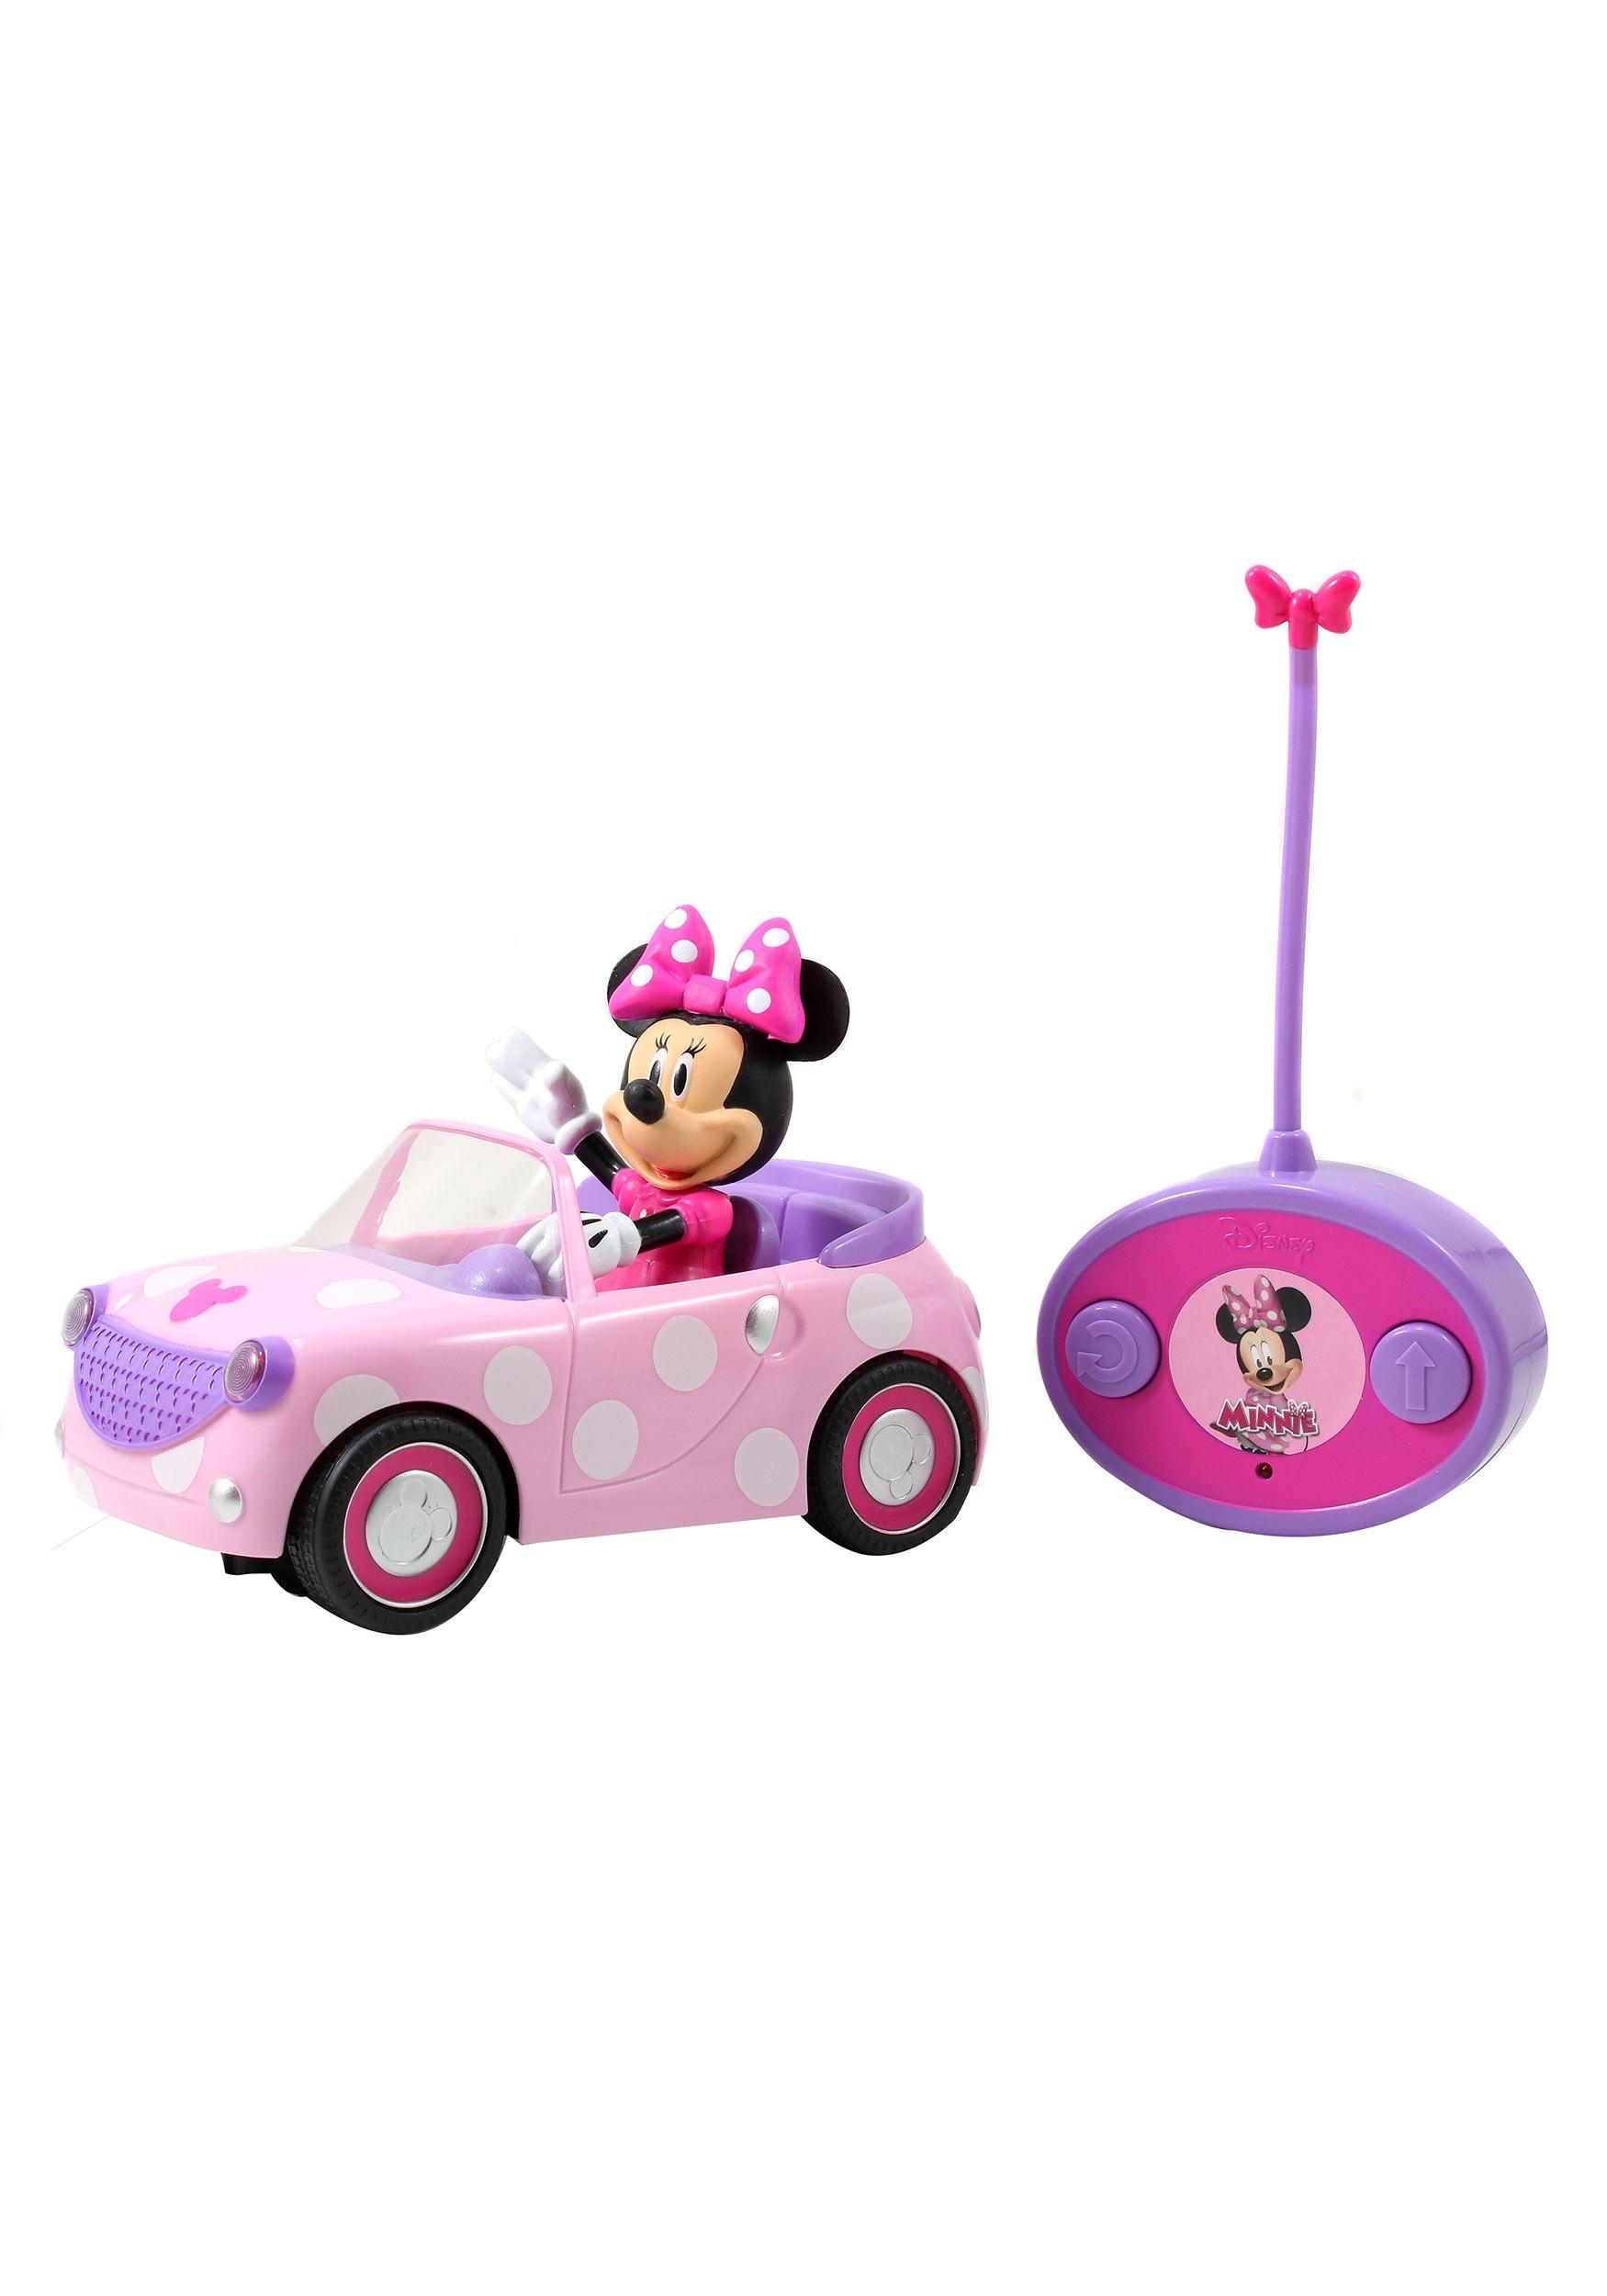 Minnie Mouse R/C Vehicle Disney